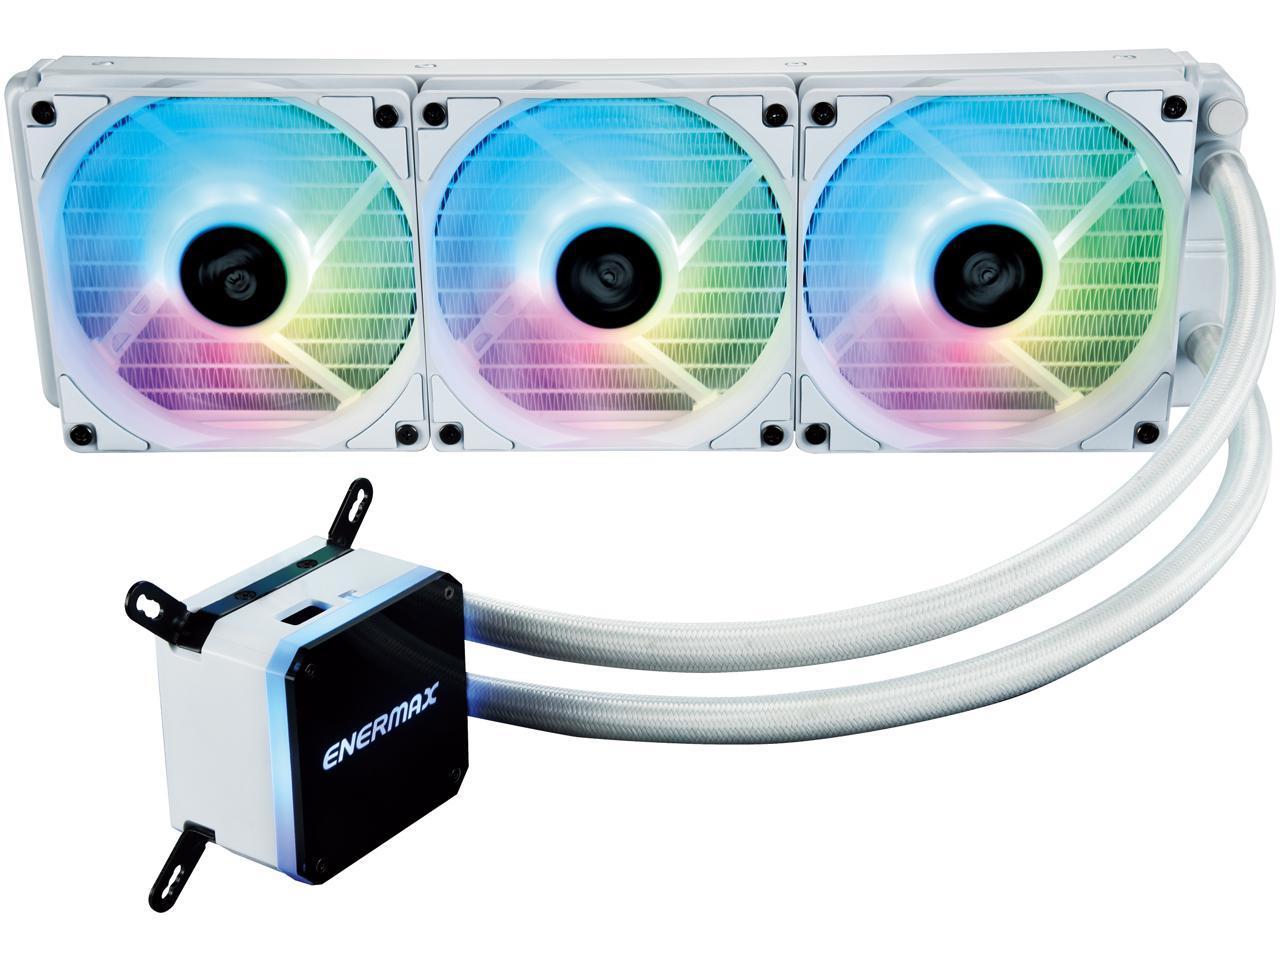 Enermax Liqmax III ARGB 360-mm All-In-One CPU Liquid Cooler $90, Enermax Aquafusion ARGB 360-mm All-In-One CPU Liquid Cooler $99 + Free Shipping